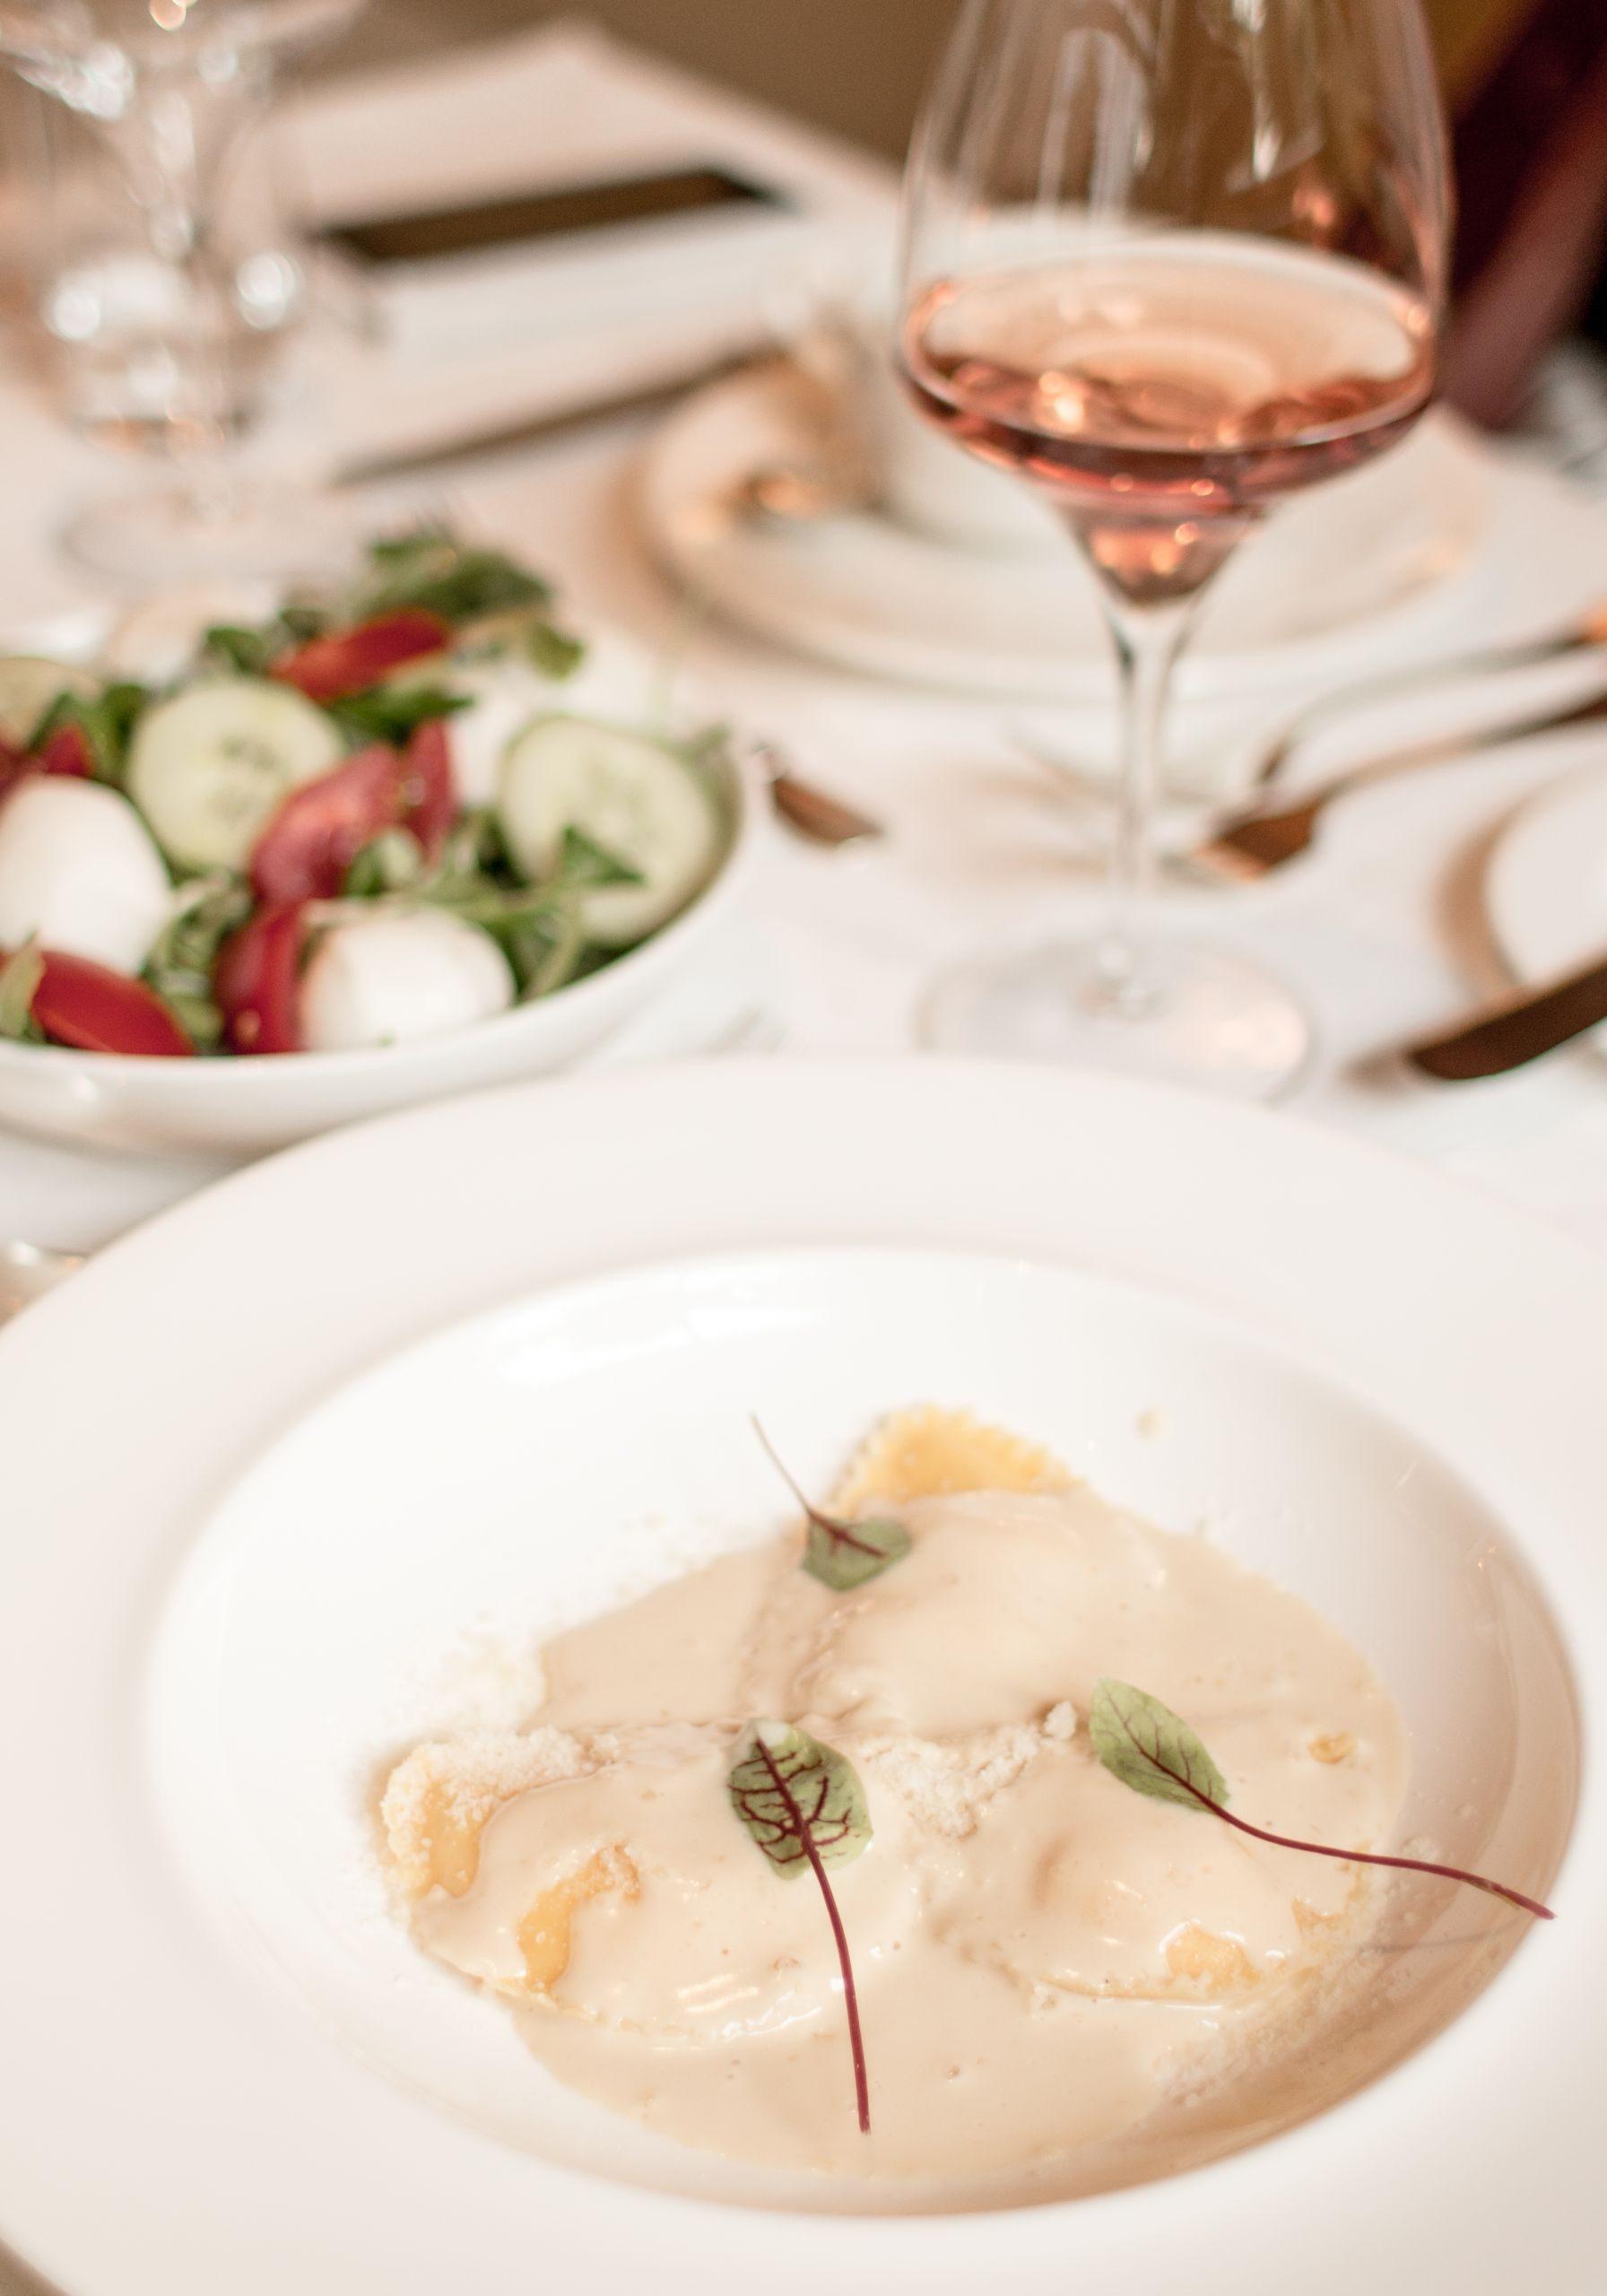 Adler Dolomites Hotel Ortisei Italy Hotel Review Evening Meal Italian pasta